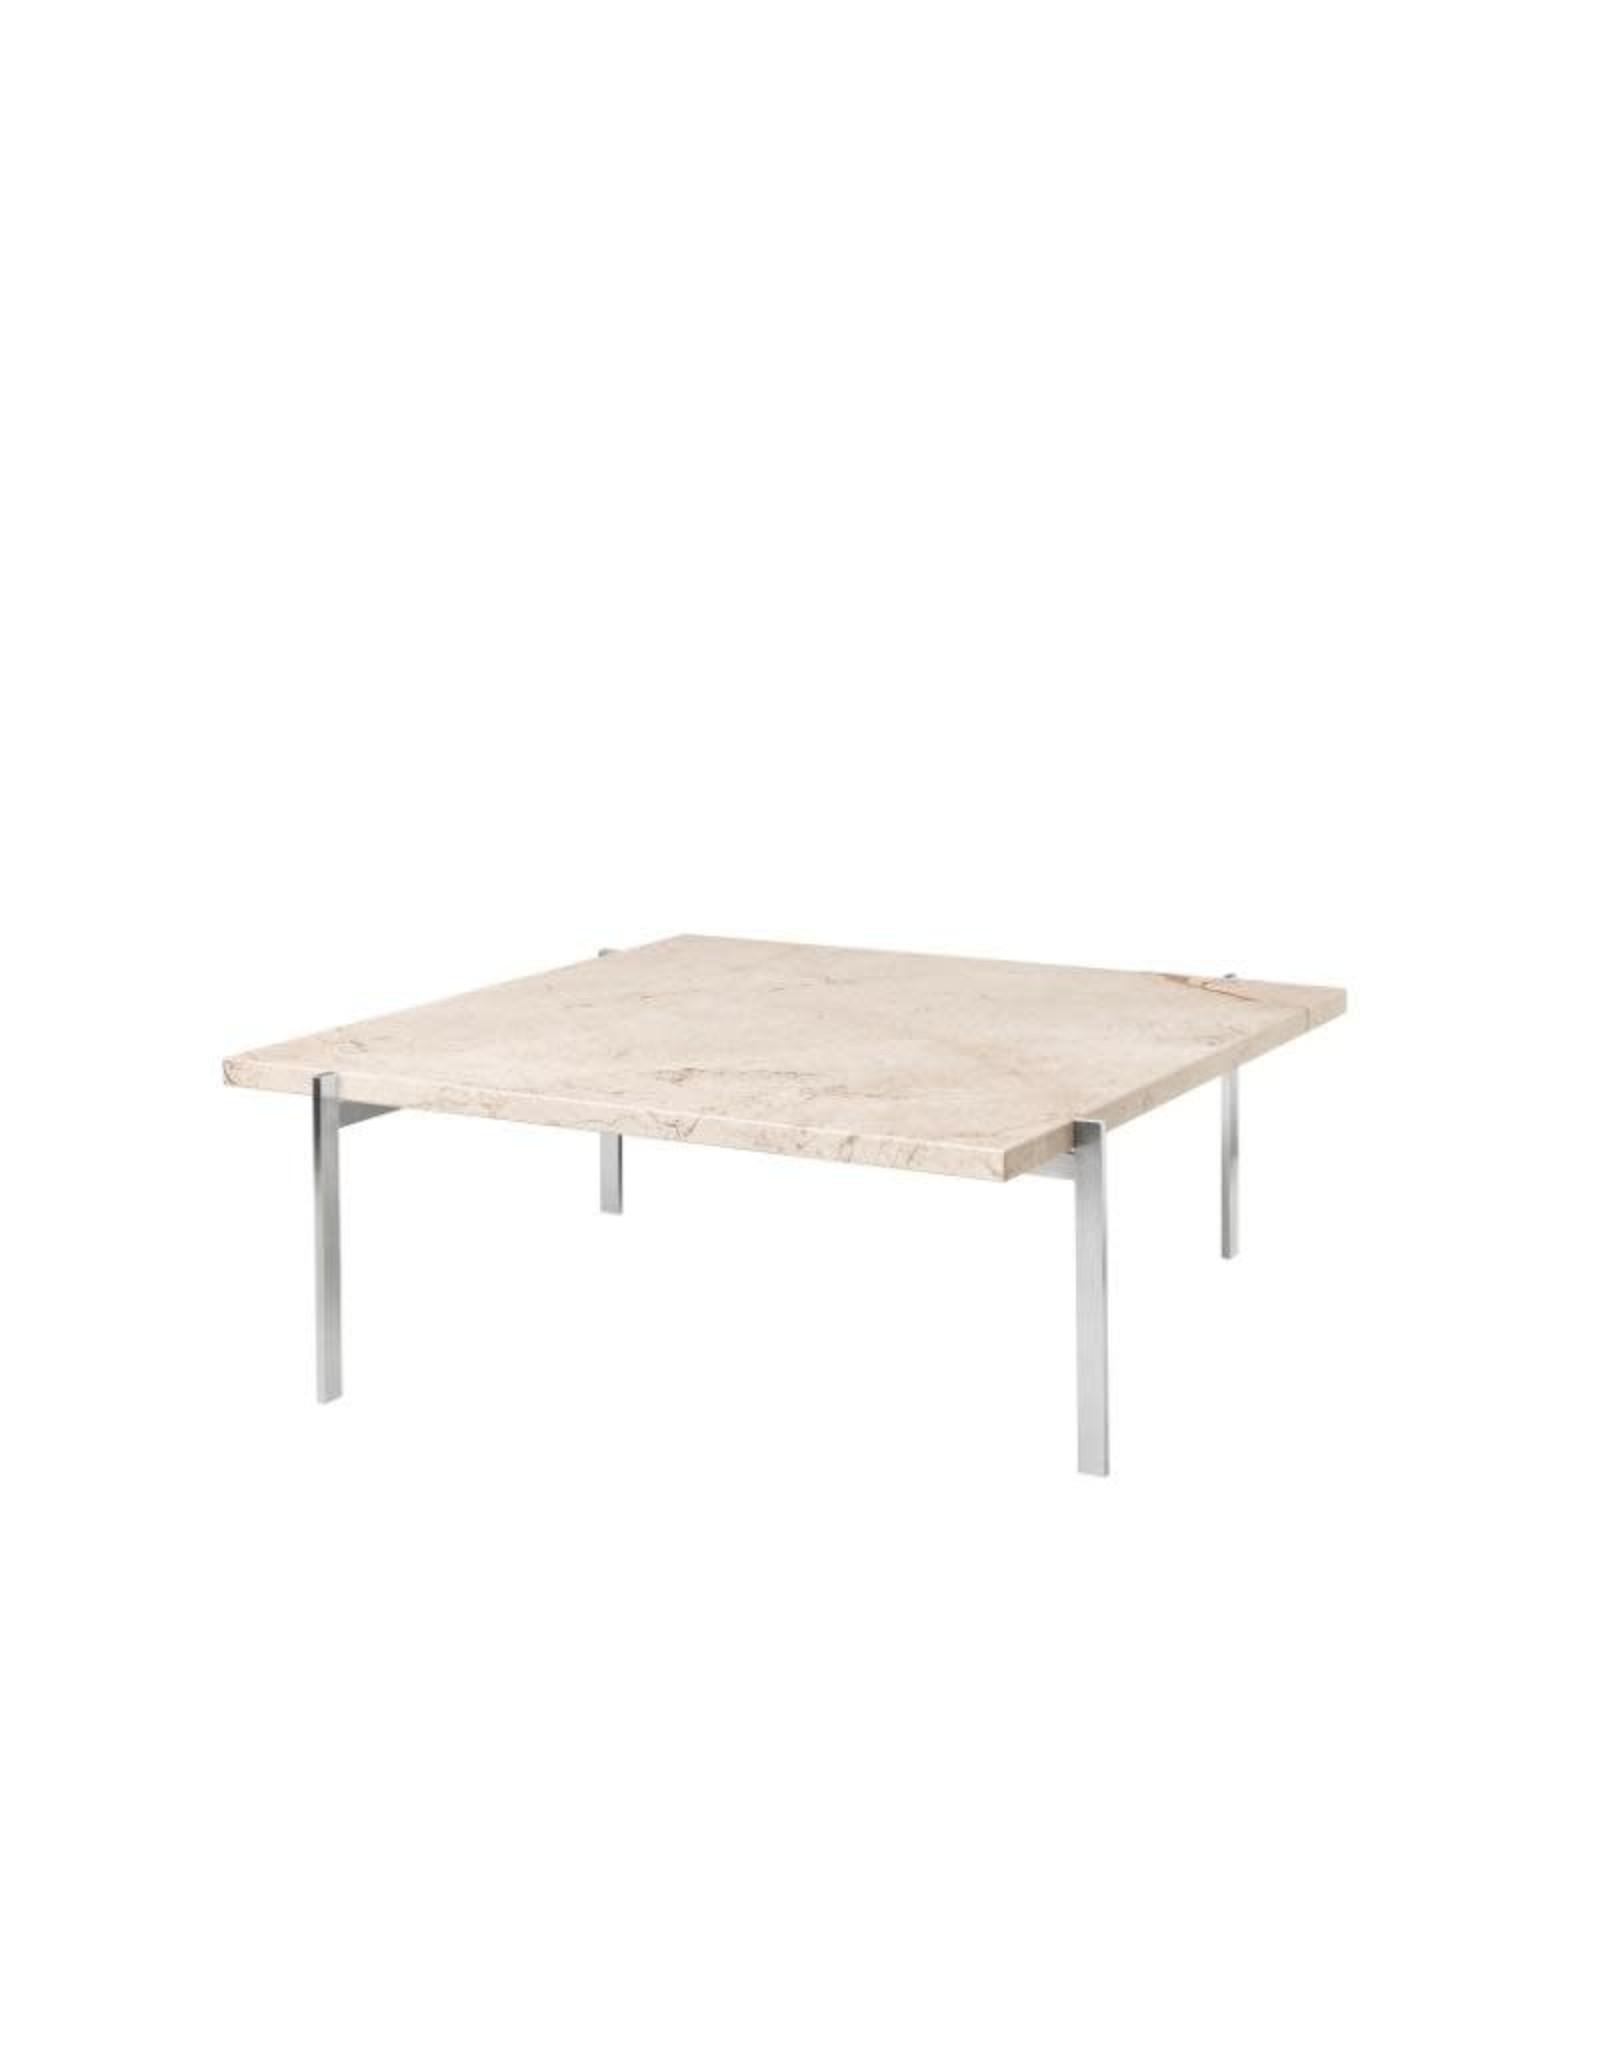 FRITZ HANSEN PK61 COFFEE TABLE IN MARBLE TOP